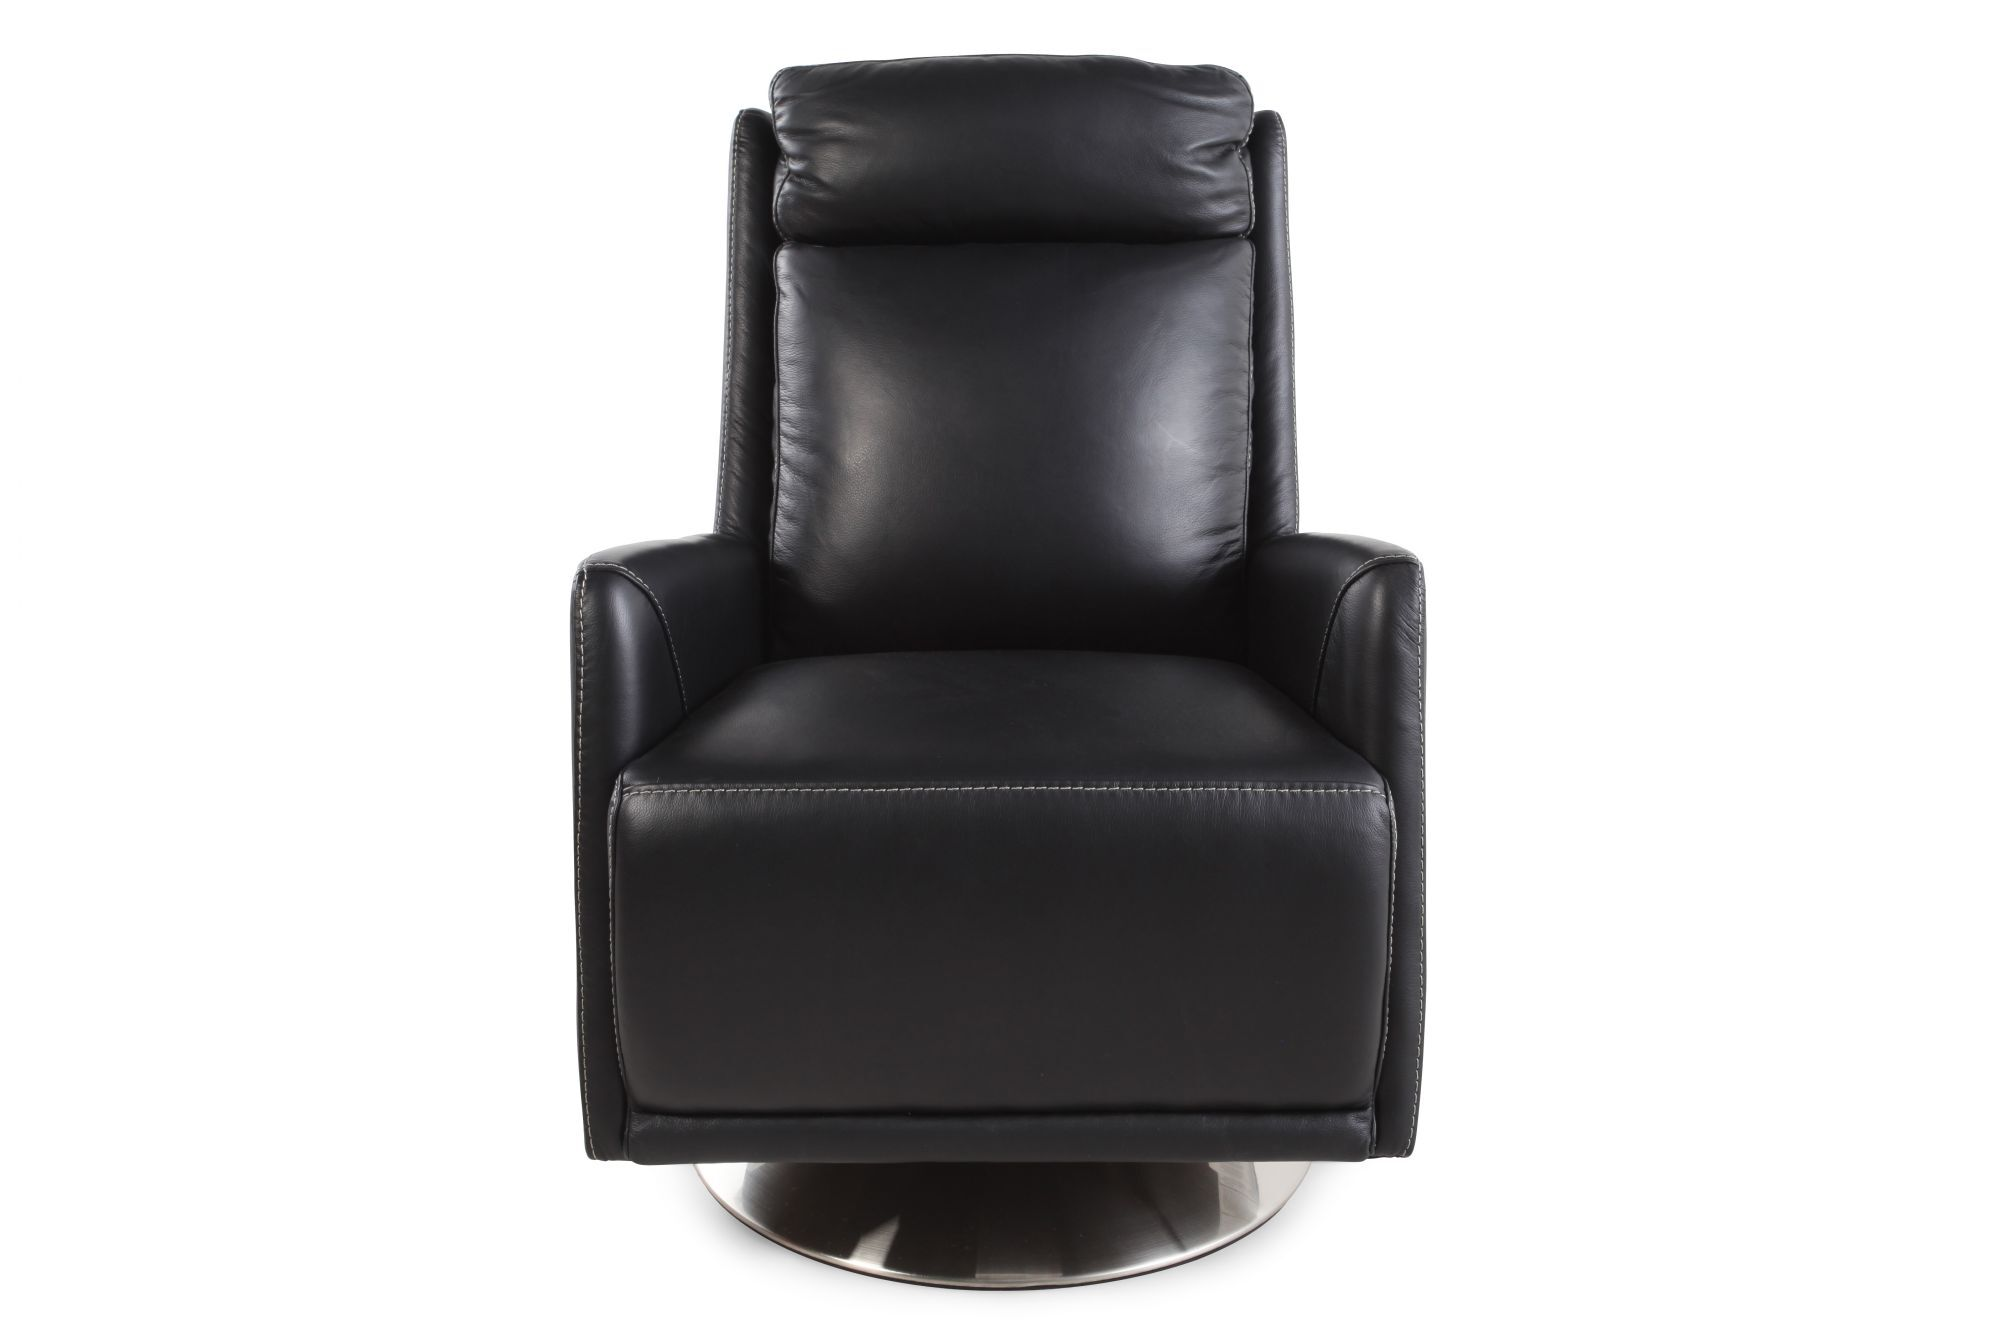 lazboy zora black leather swivel chair - La Z Boy Office Chair